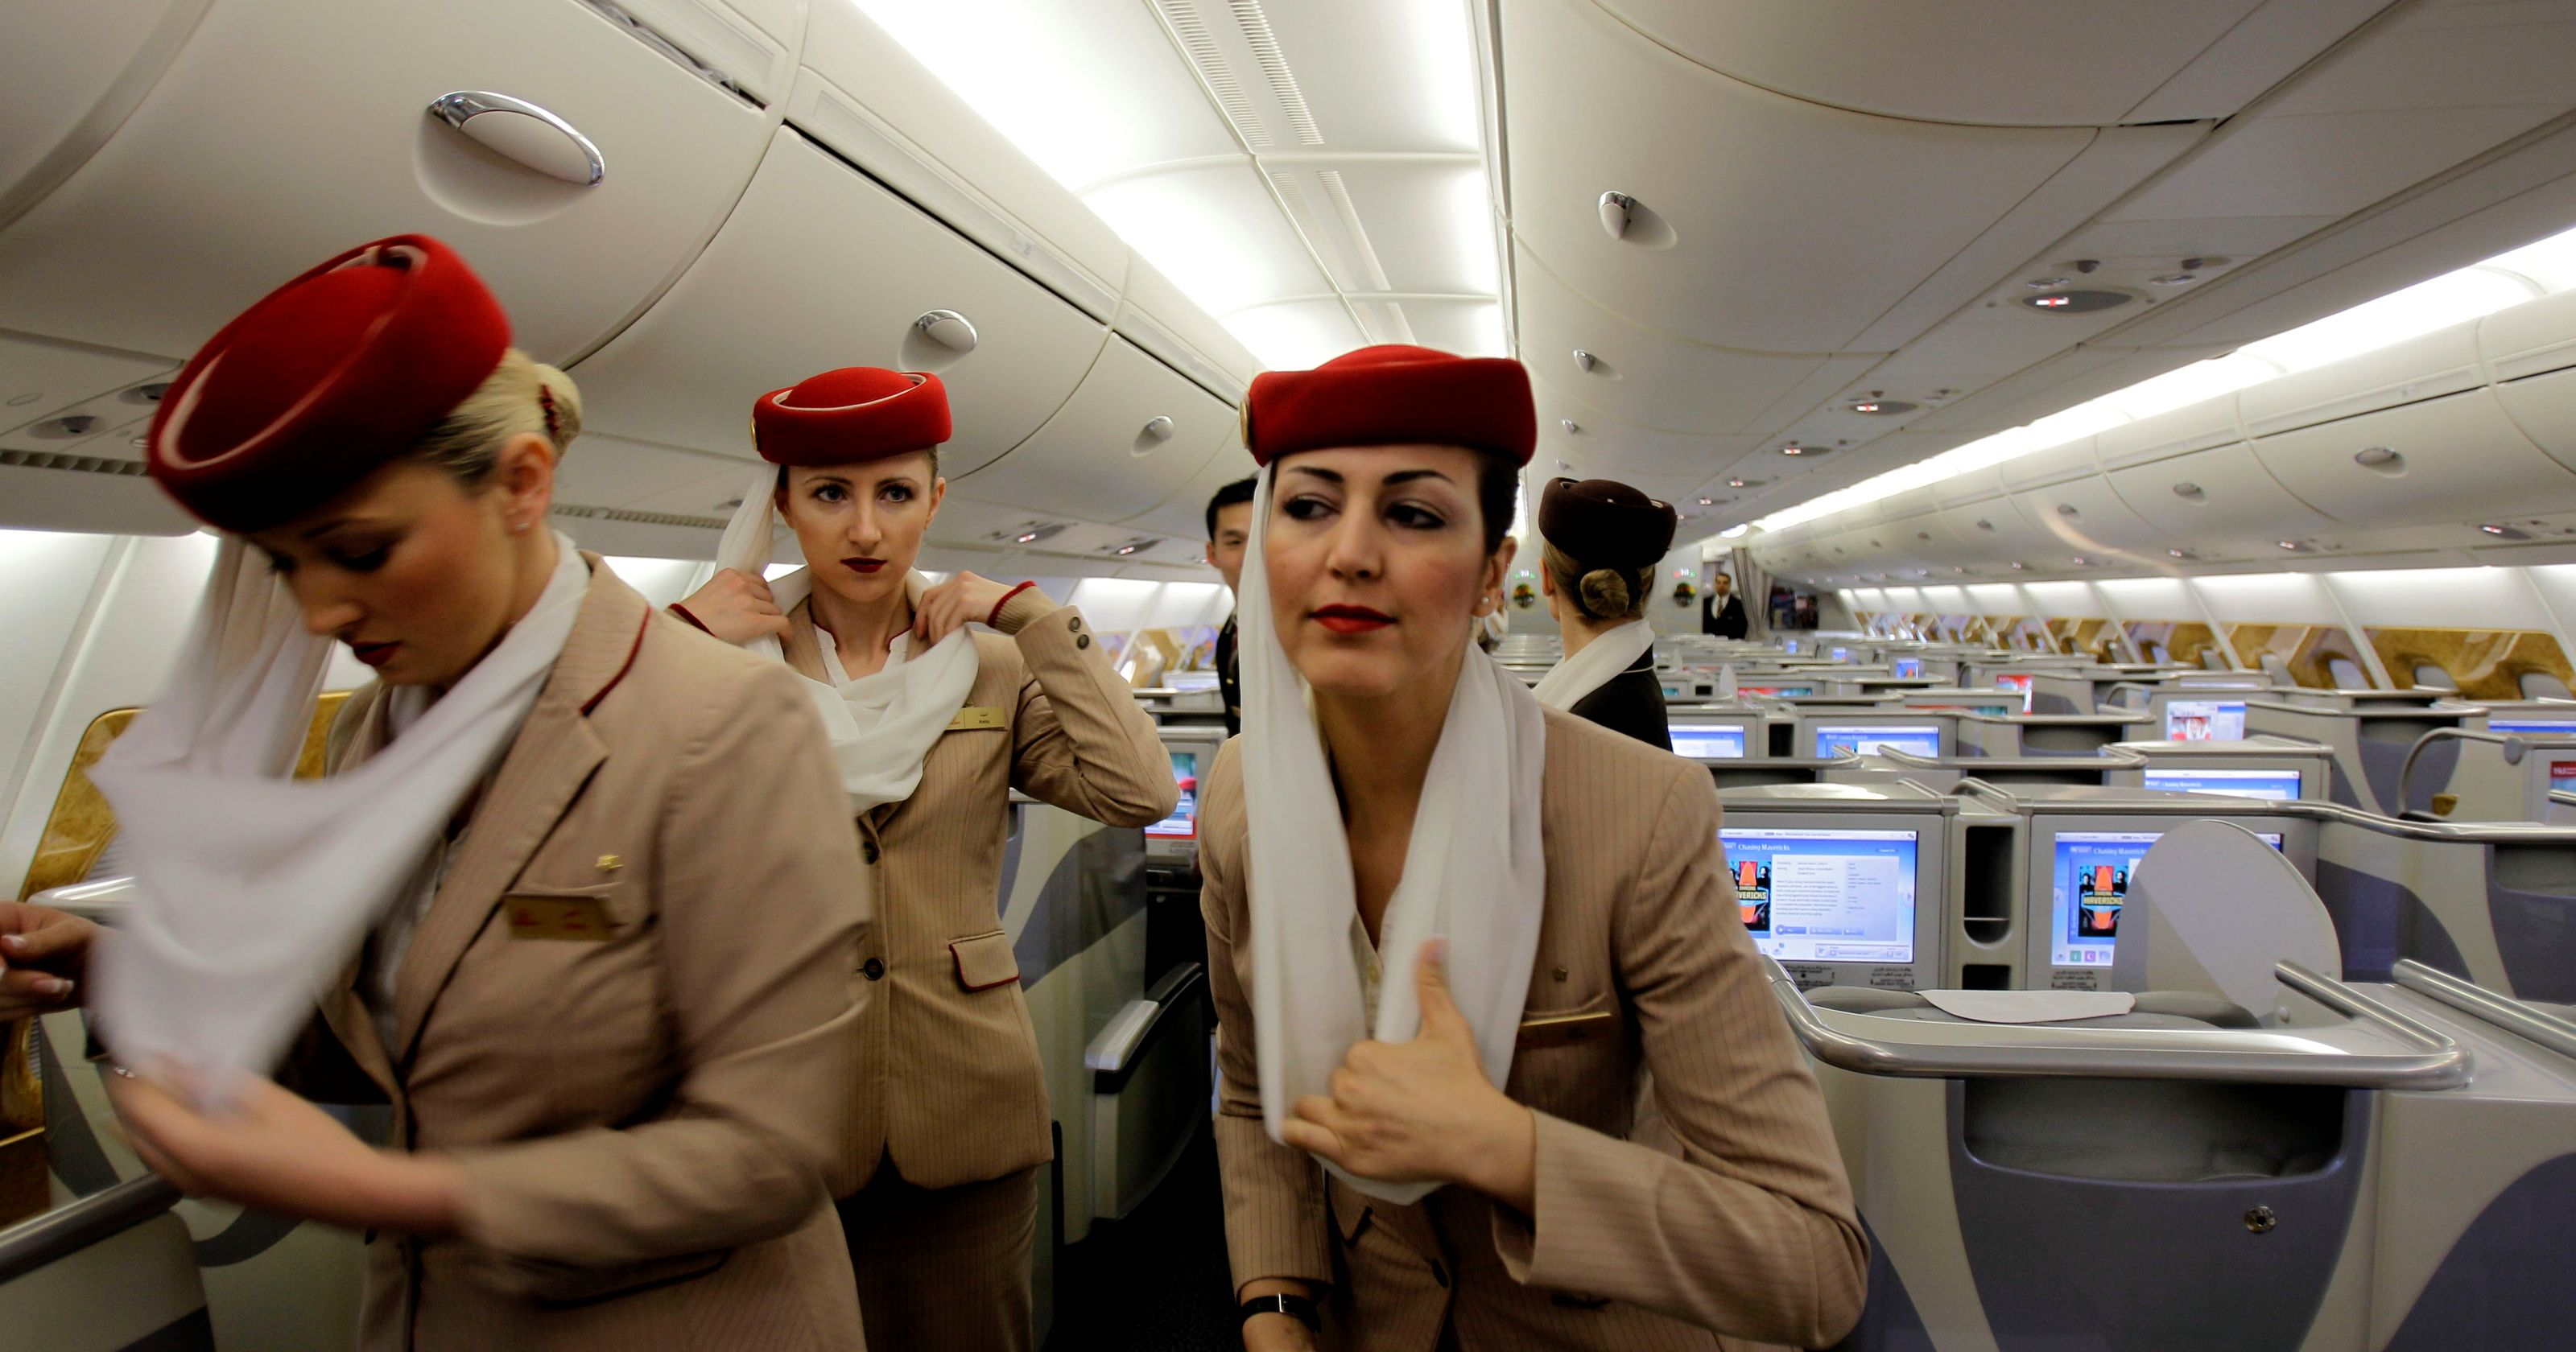 coachella kissing video emirates